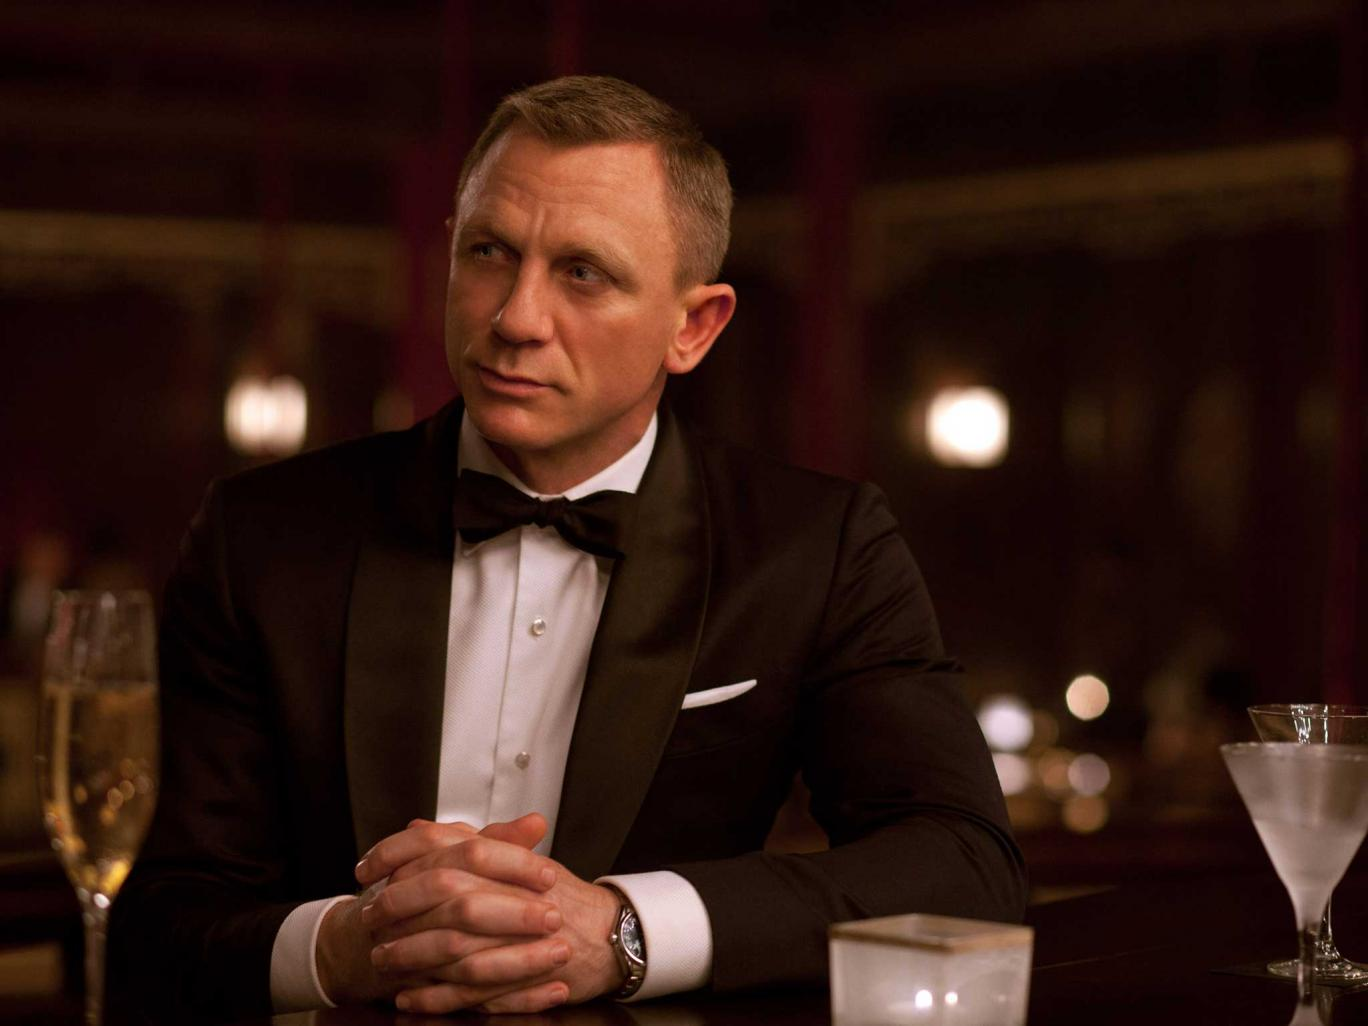 Craig as James Bond